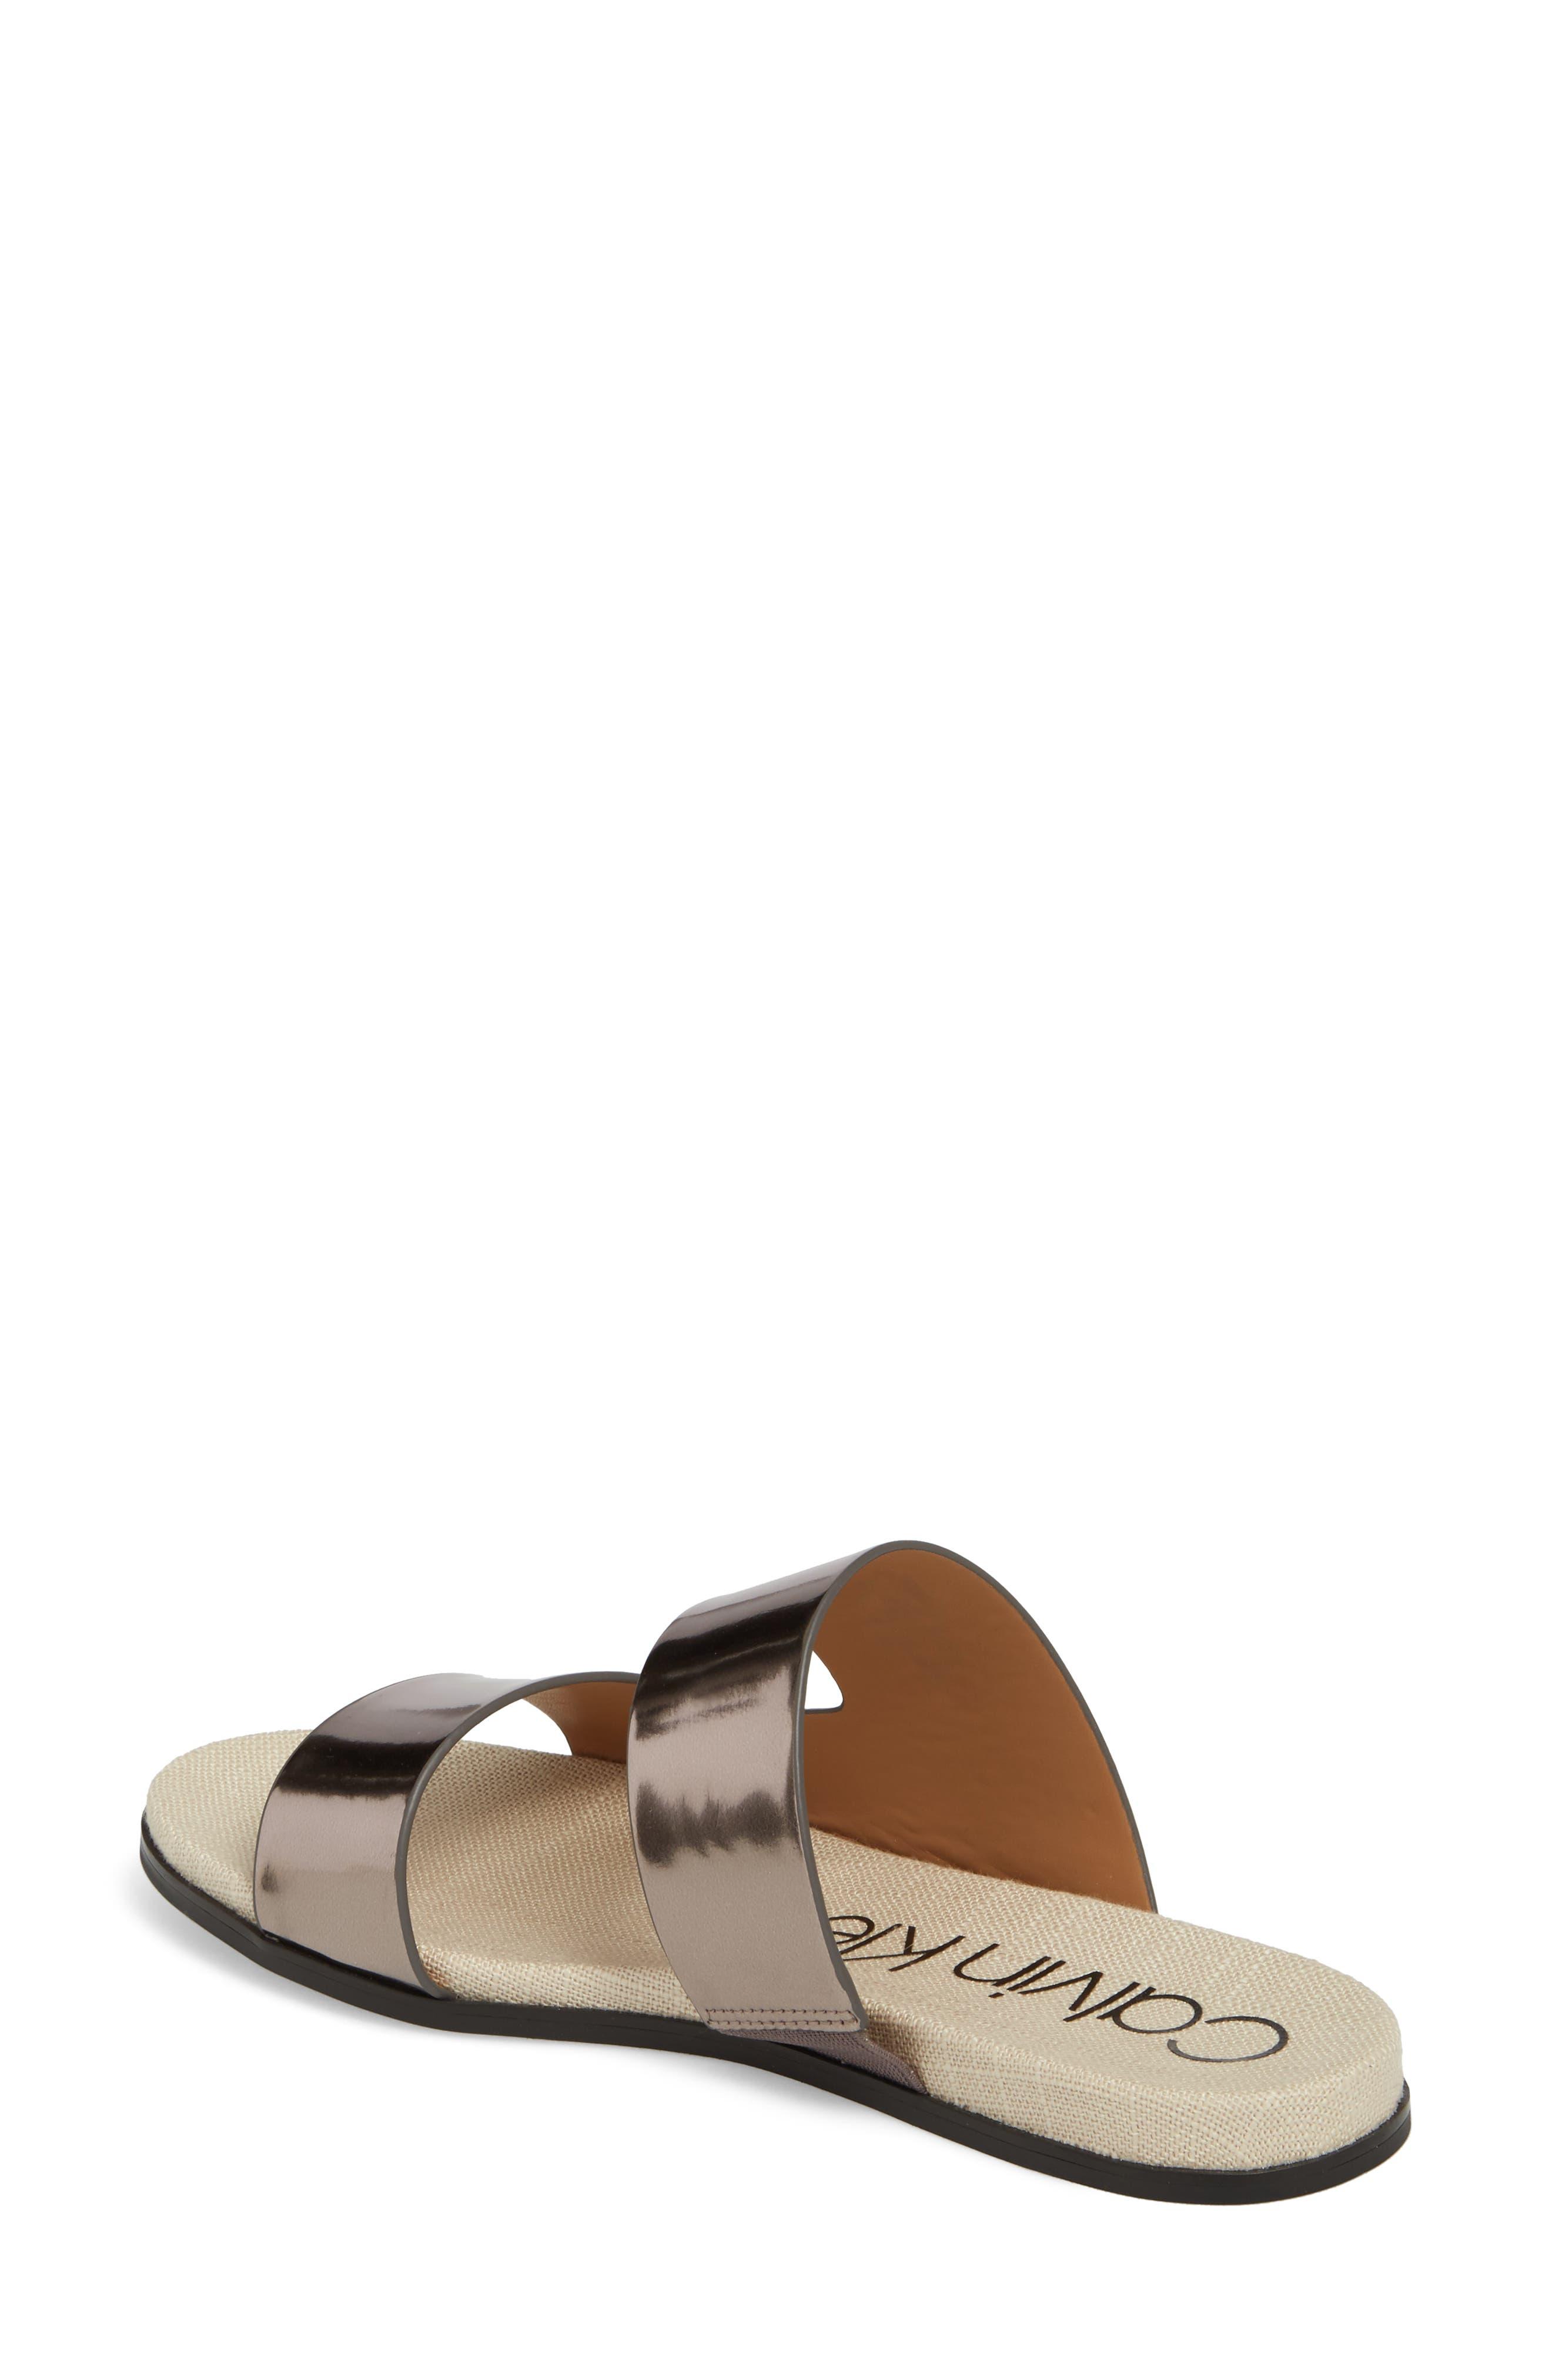 Posey Slide Sandal,                             Alternate thumbnail 2, color,                             Pewter Leather